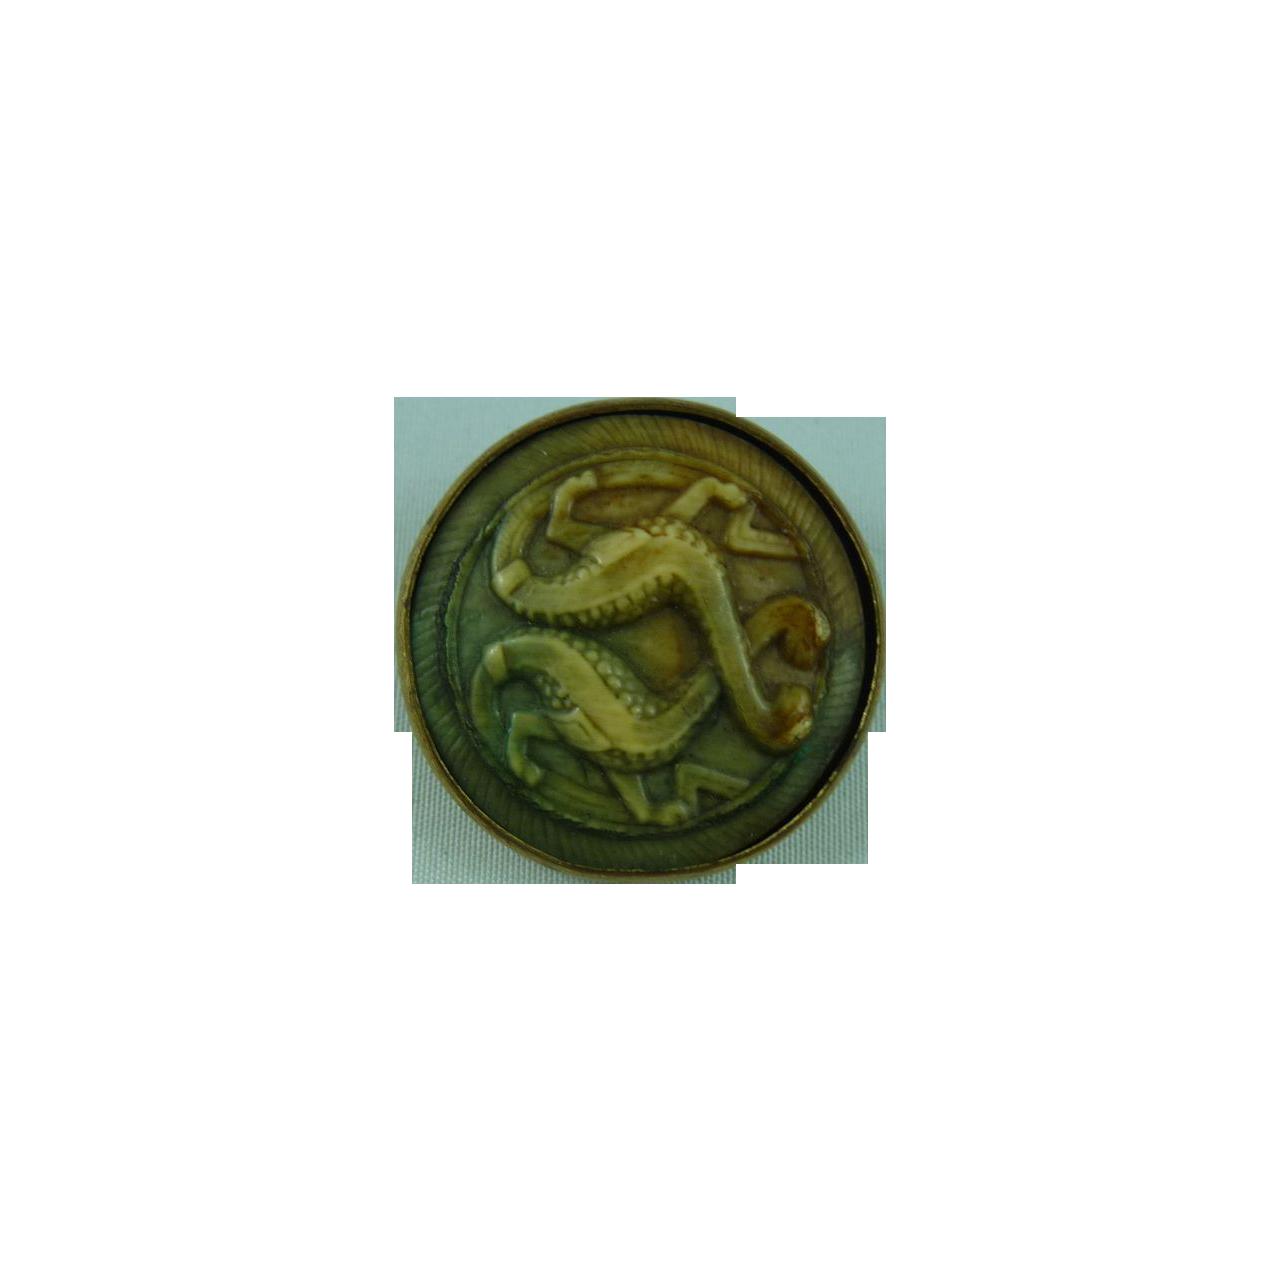 Rare Dinosaur Vintage Button